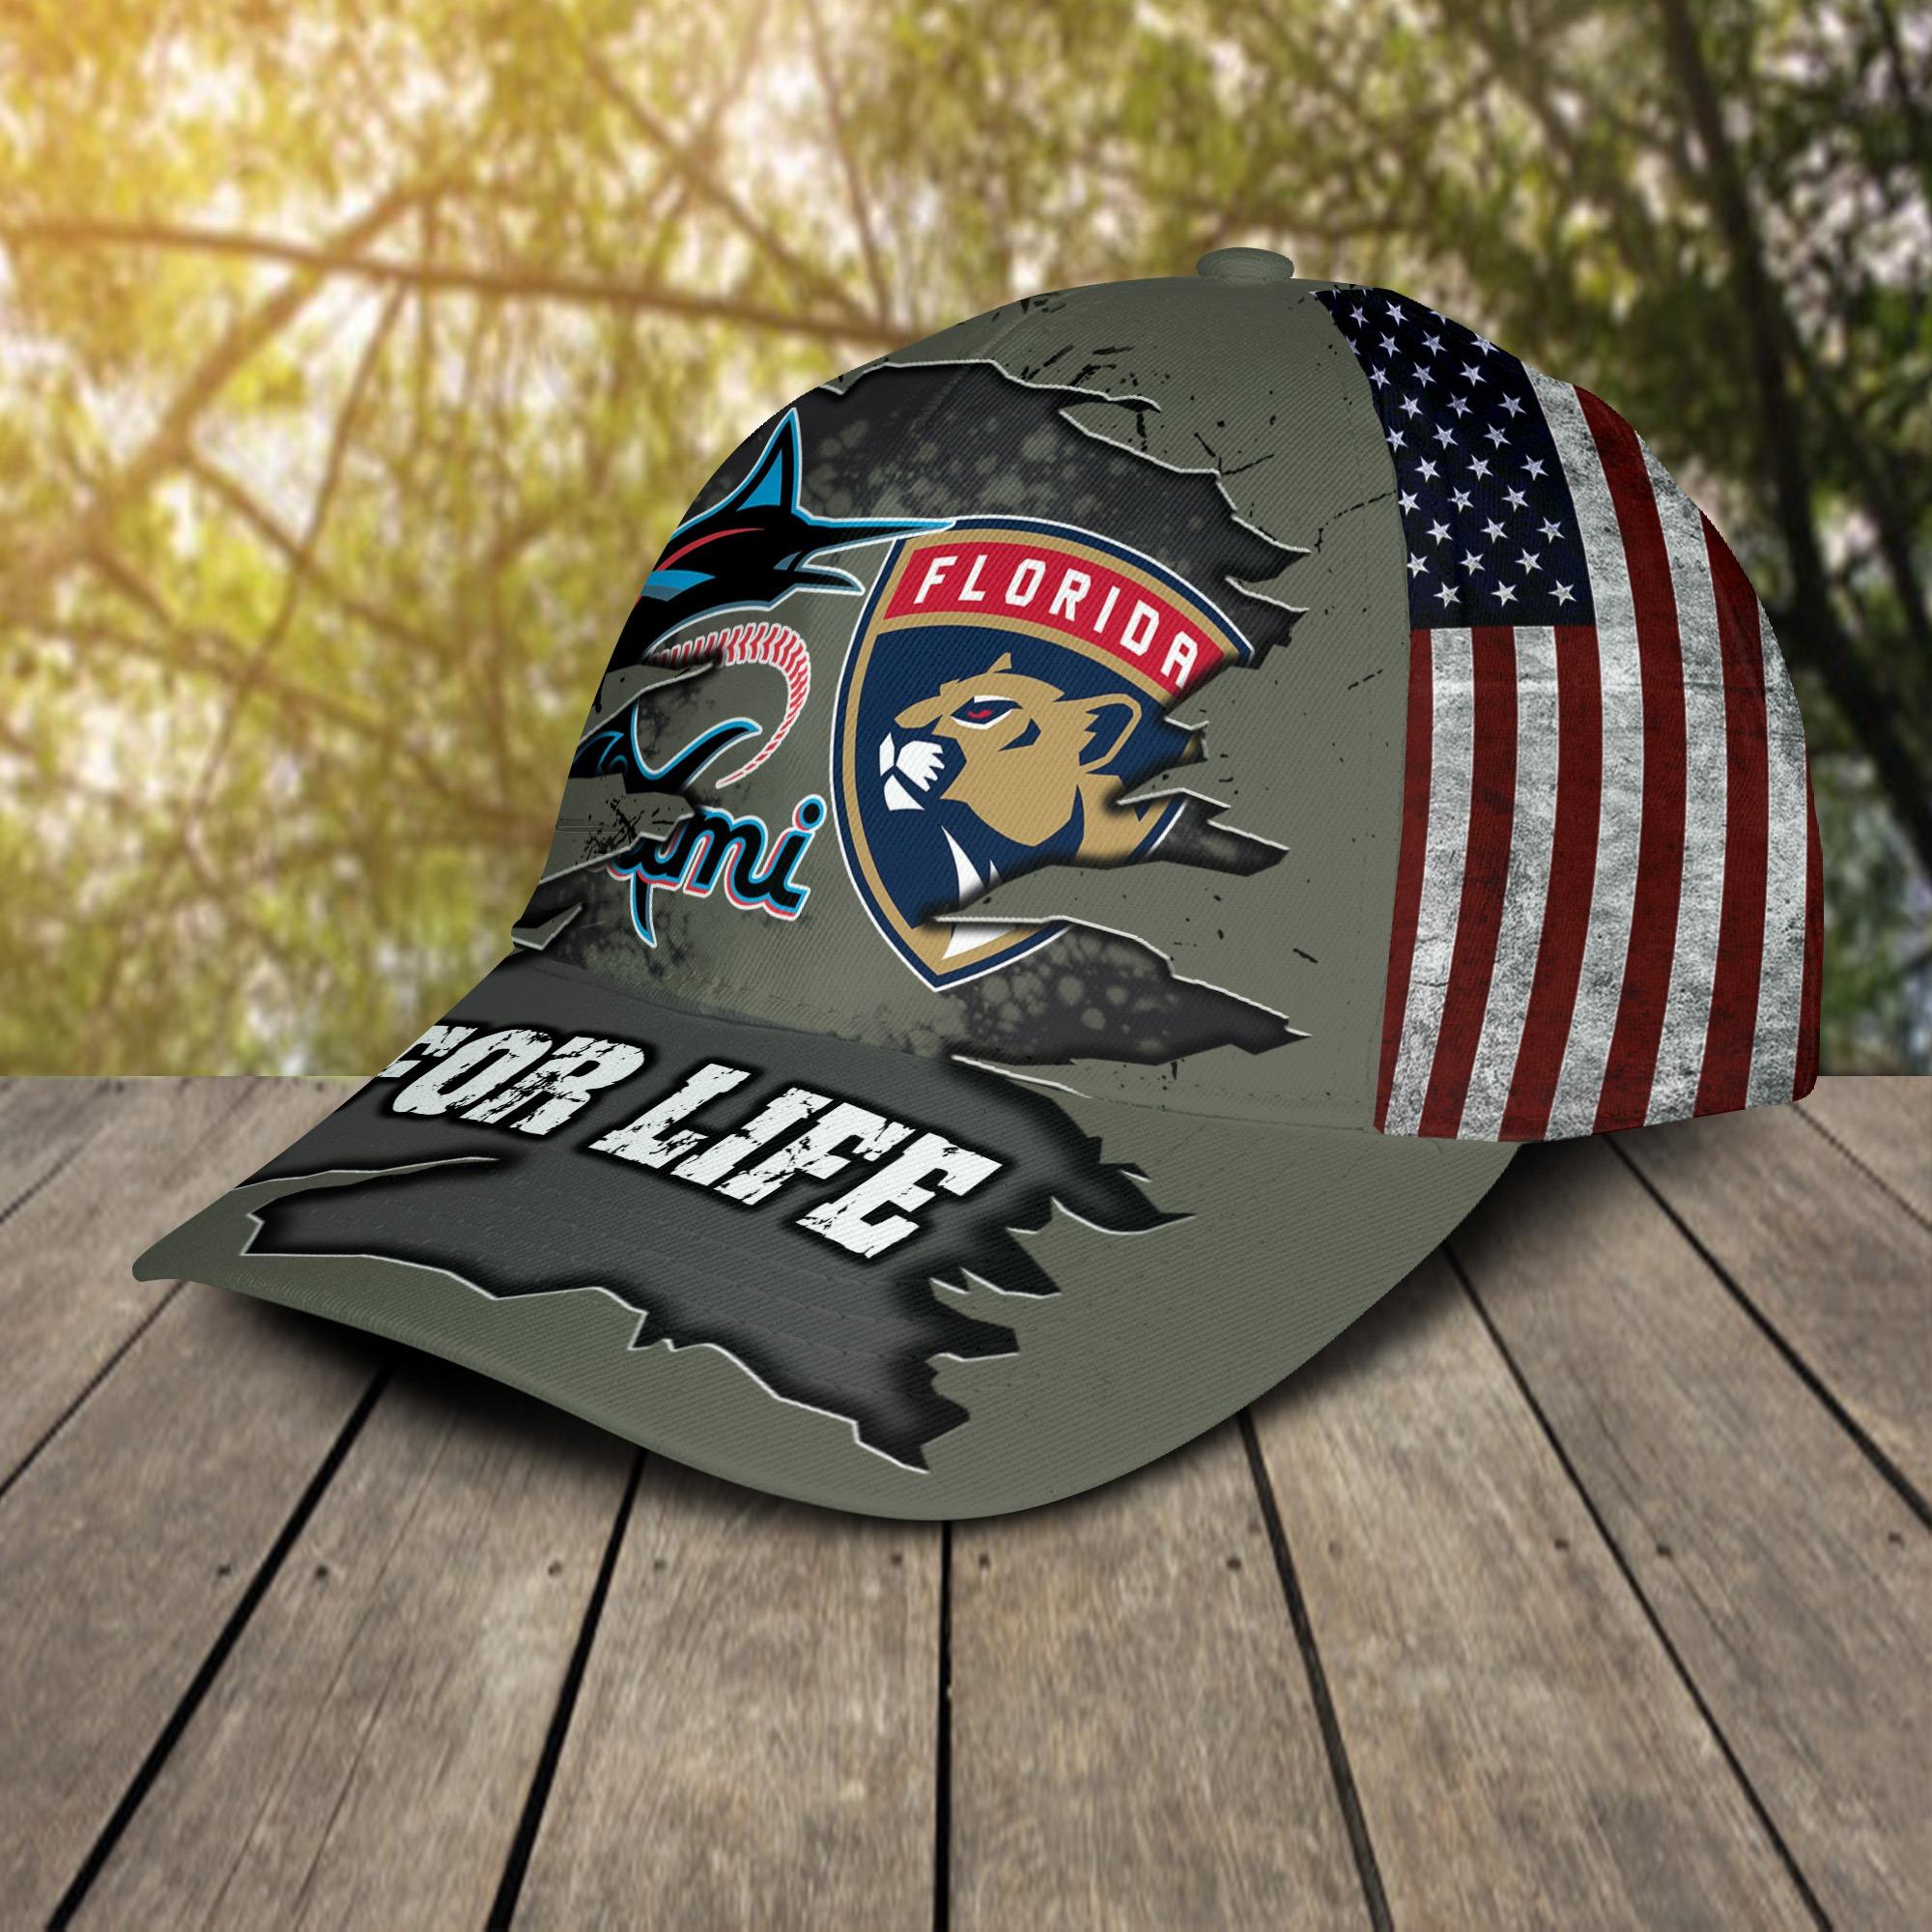 Miami Marlins Florida Panthers For Life Cap 2